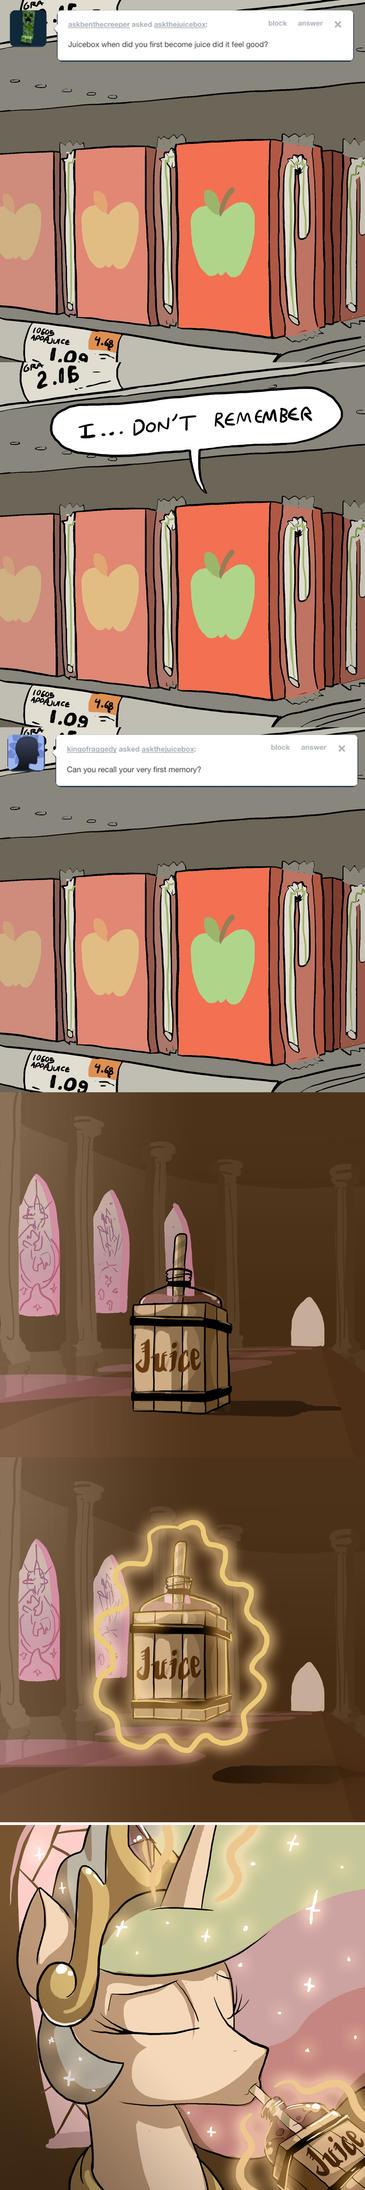 Green Apple Juicebox Memories by DocWario